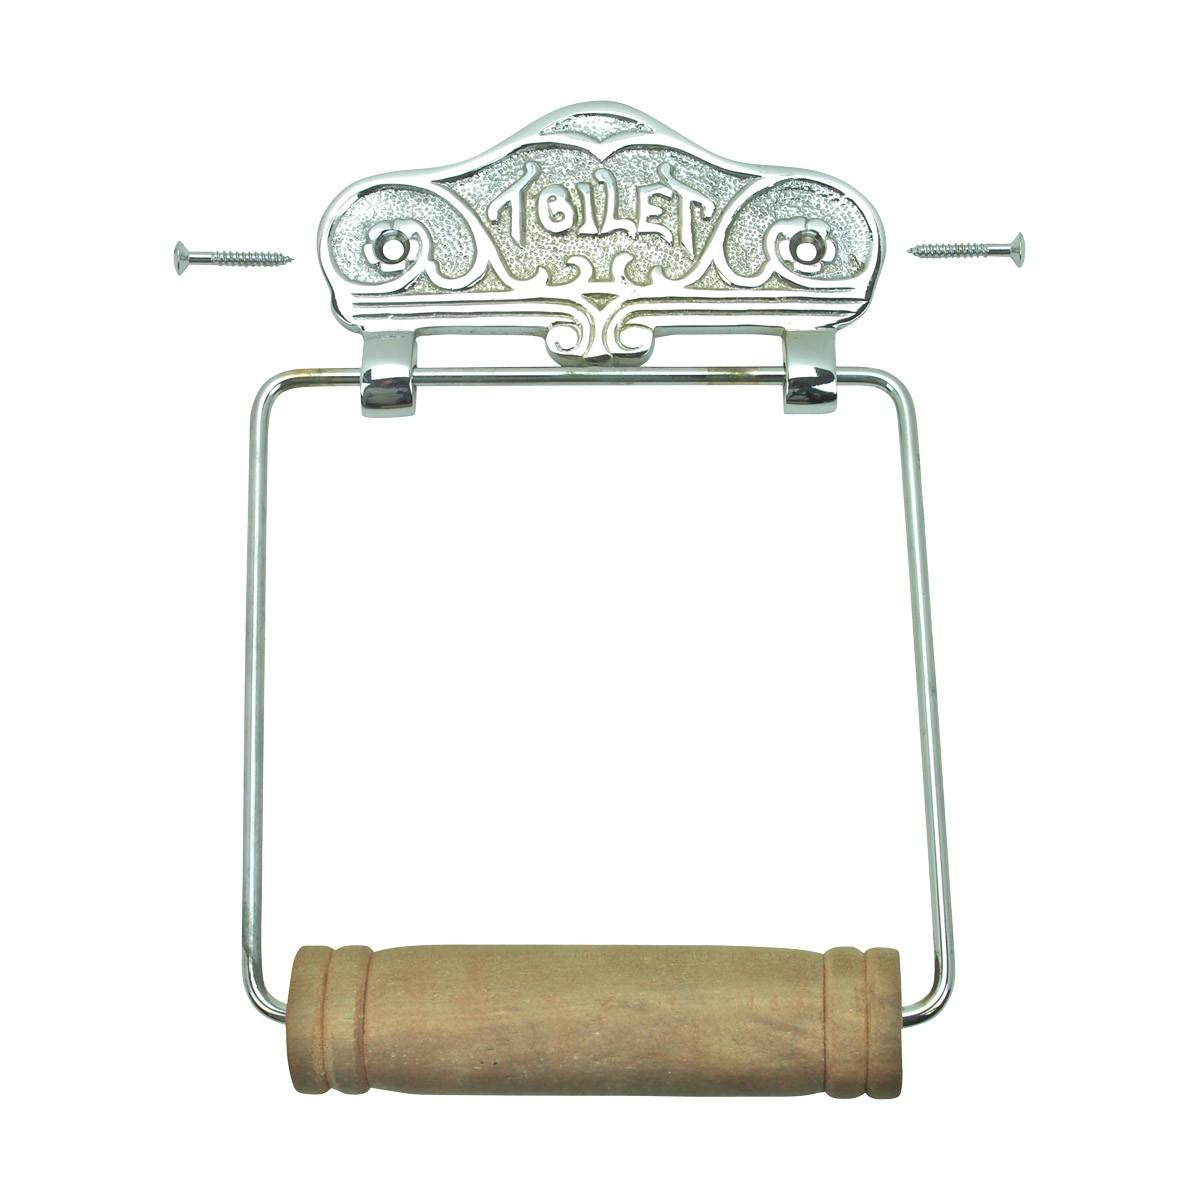 Antique Toilet Paper Holder Chrome Toilet Tissue Holder TP Holder TP Holders Toilet Paper Holder